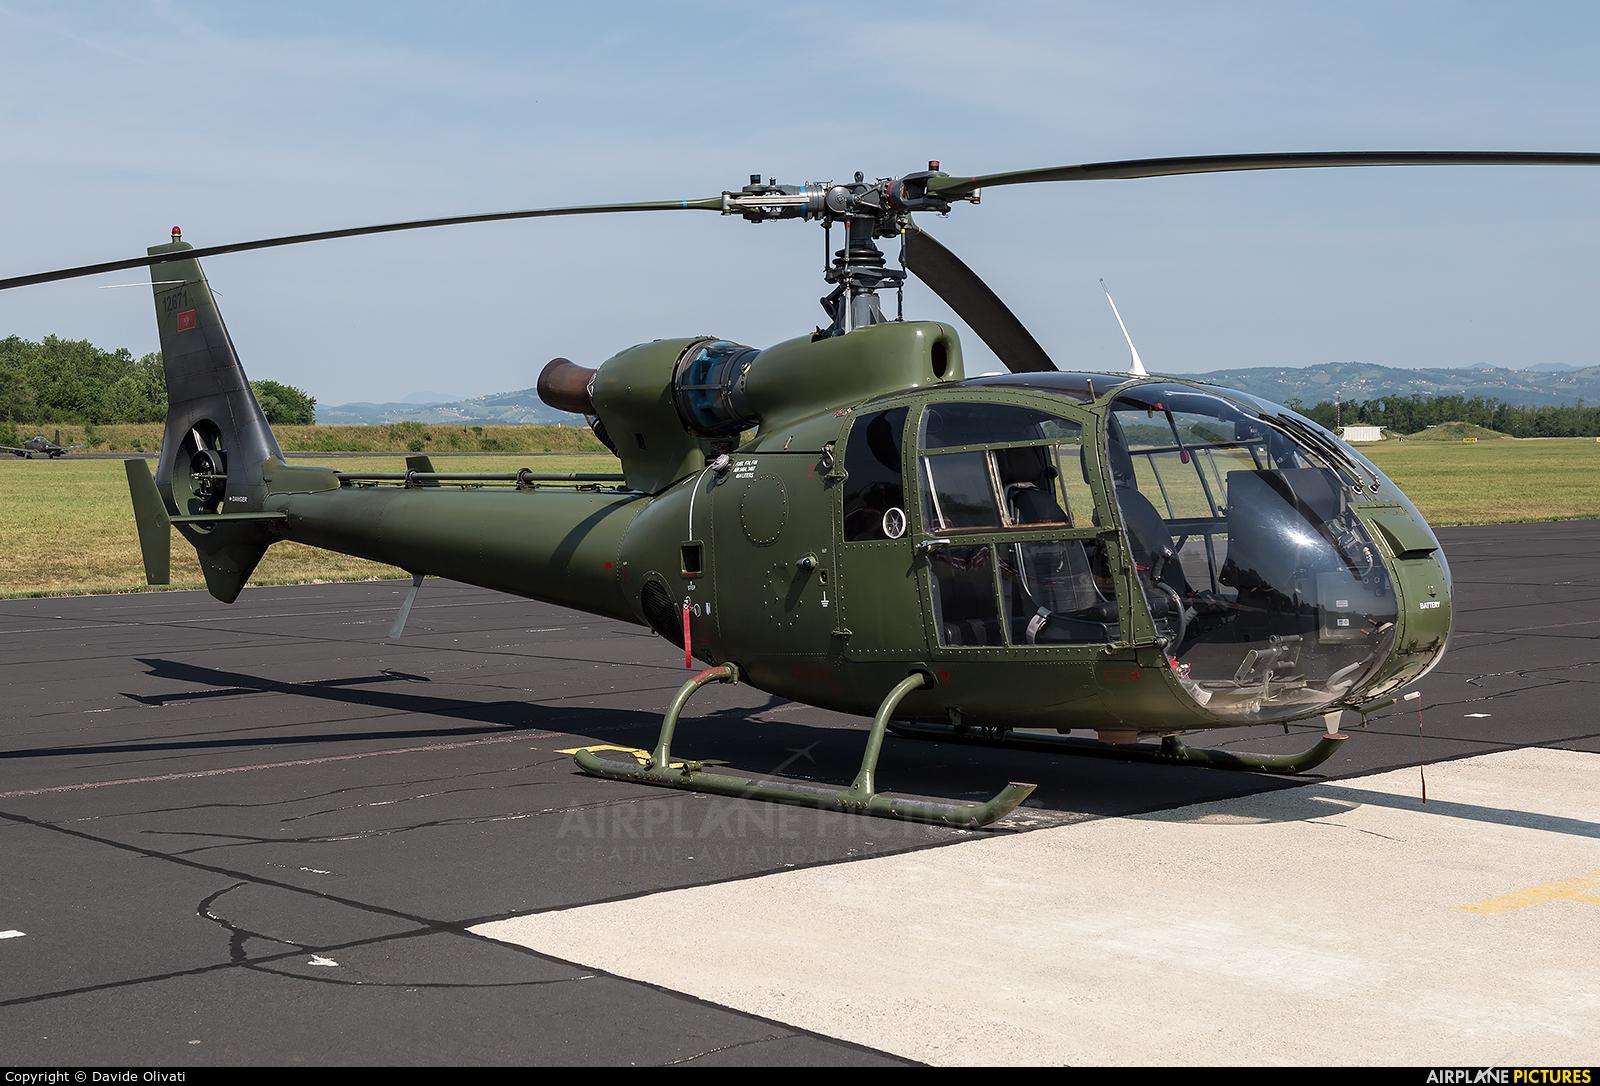 Montenegro - Air Force 12671 aircraft at Cerklje